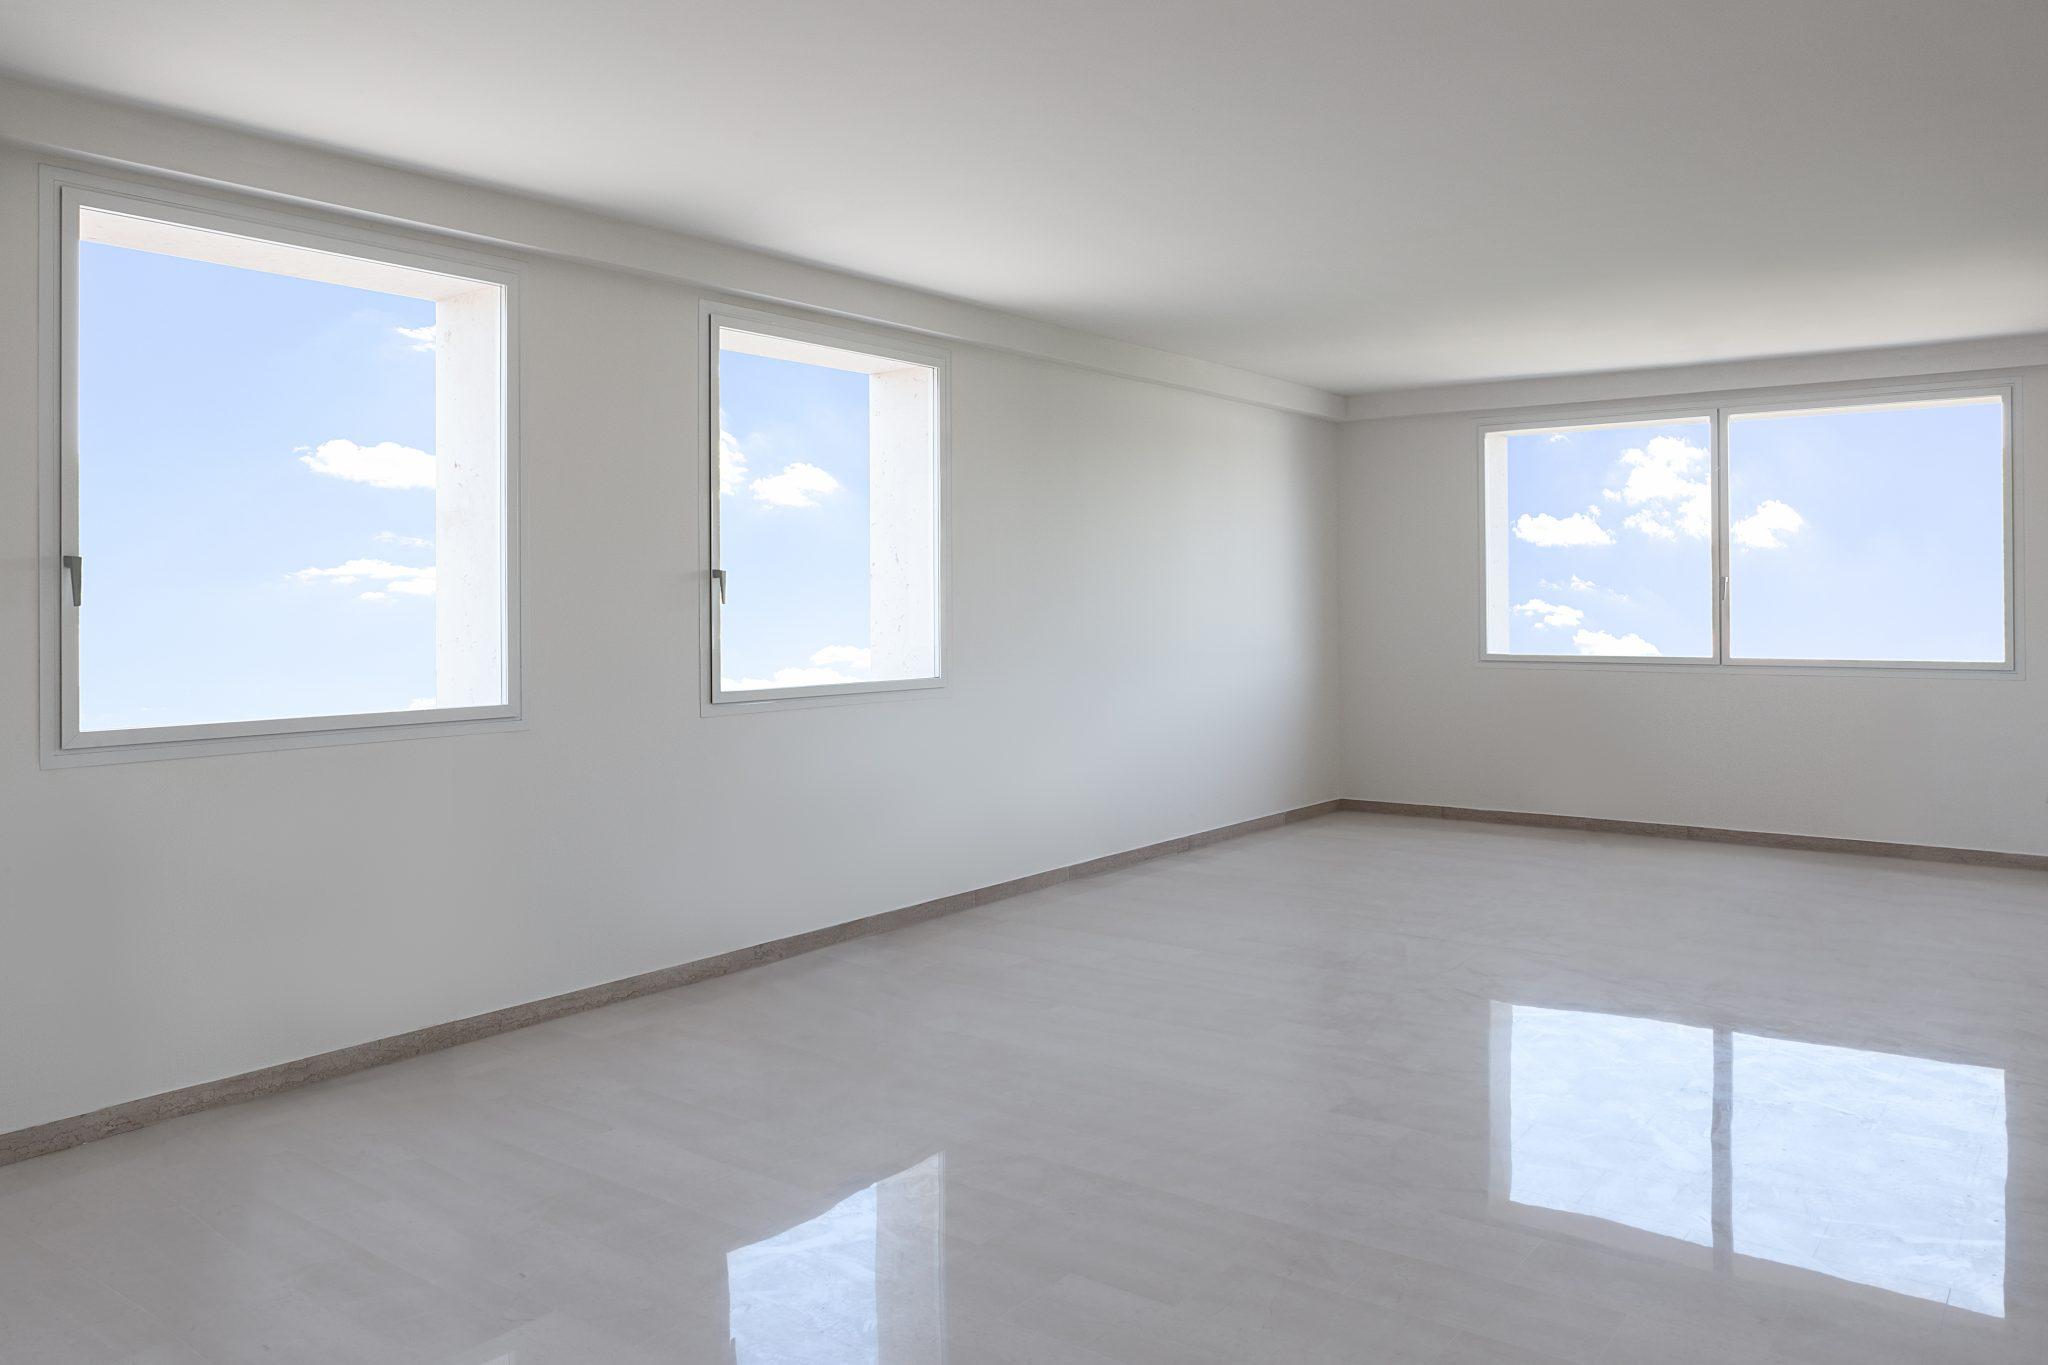 Ester window es finestra glazing solutions bluebell for Es finestra